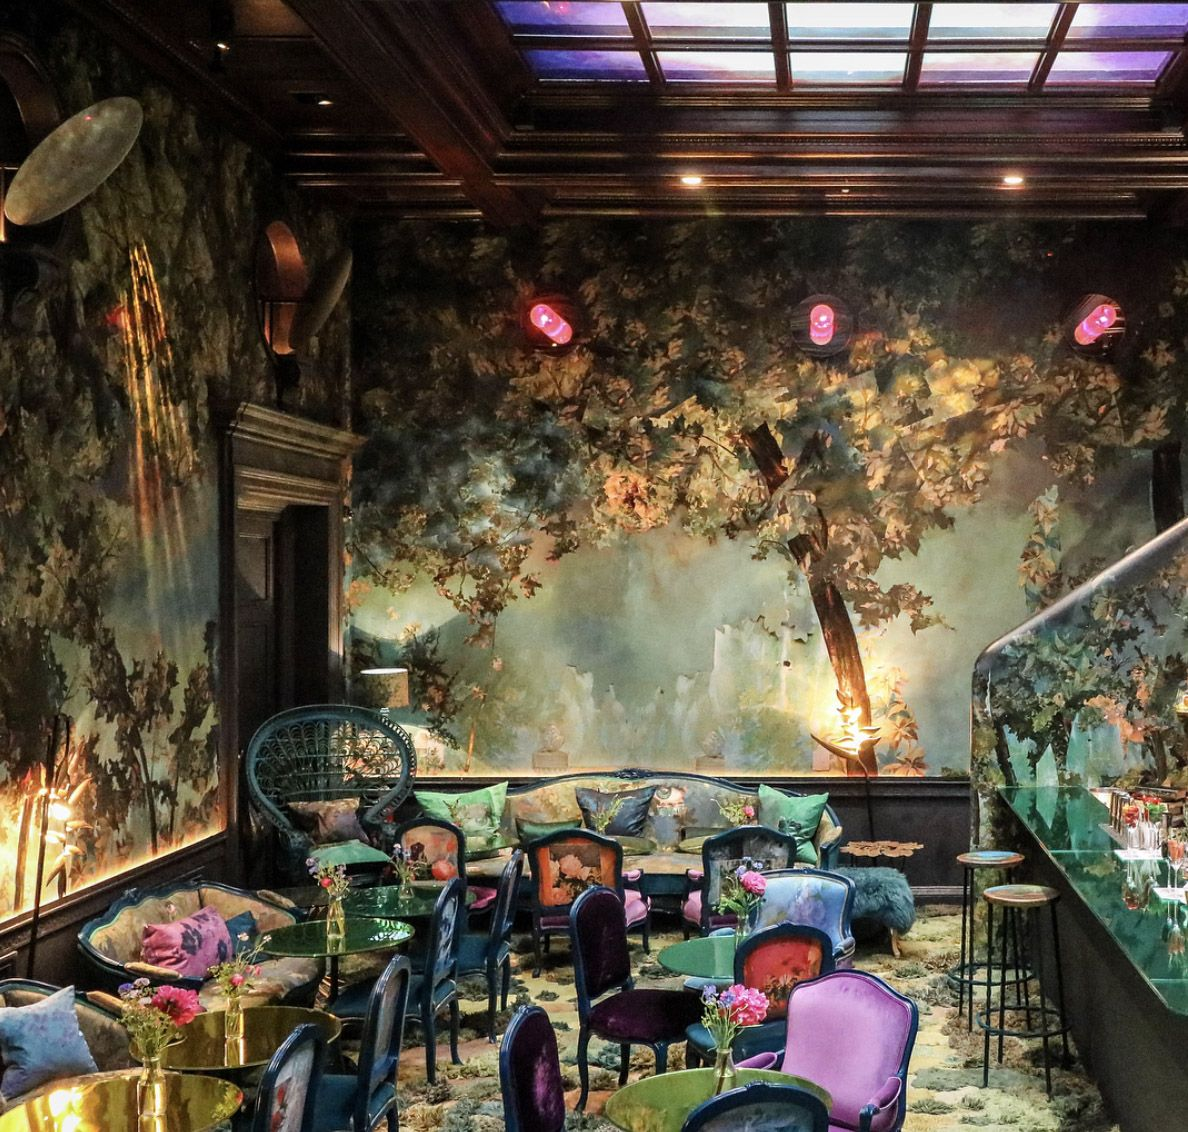 48 Hours In London Sketch London Restaurant Sketch Gallery